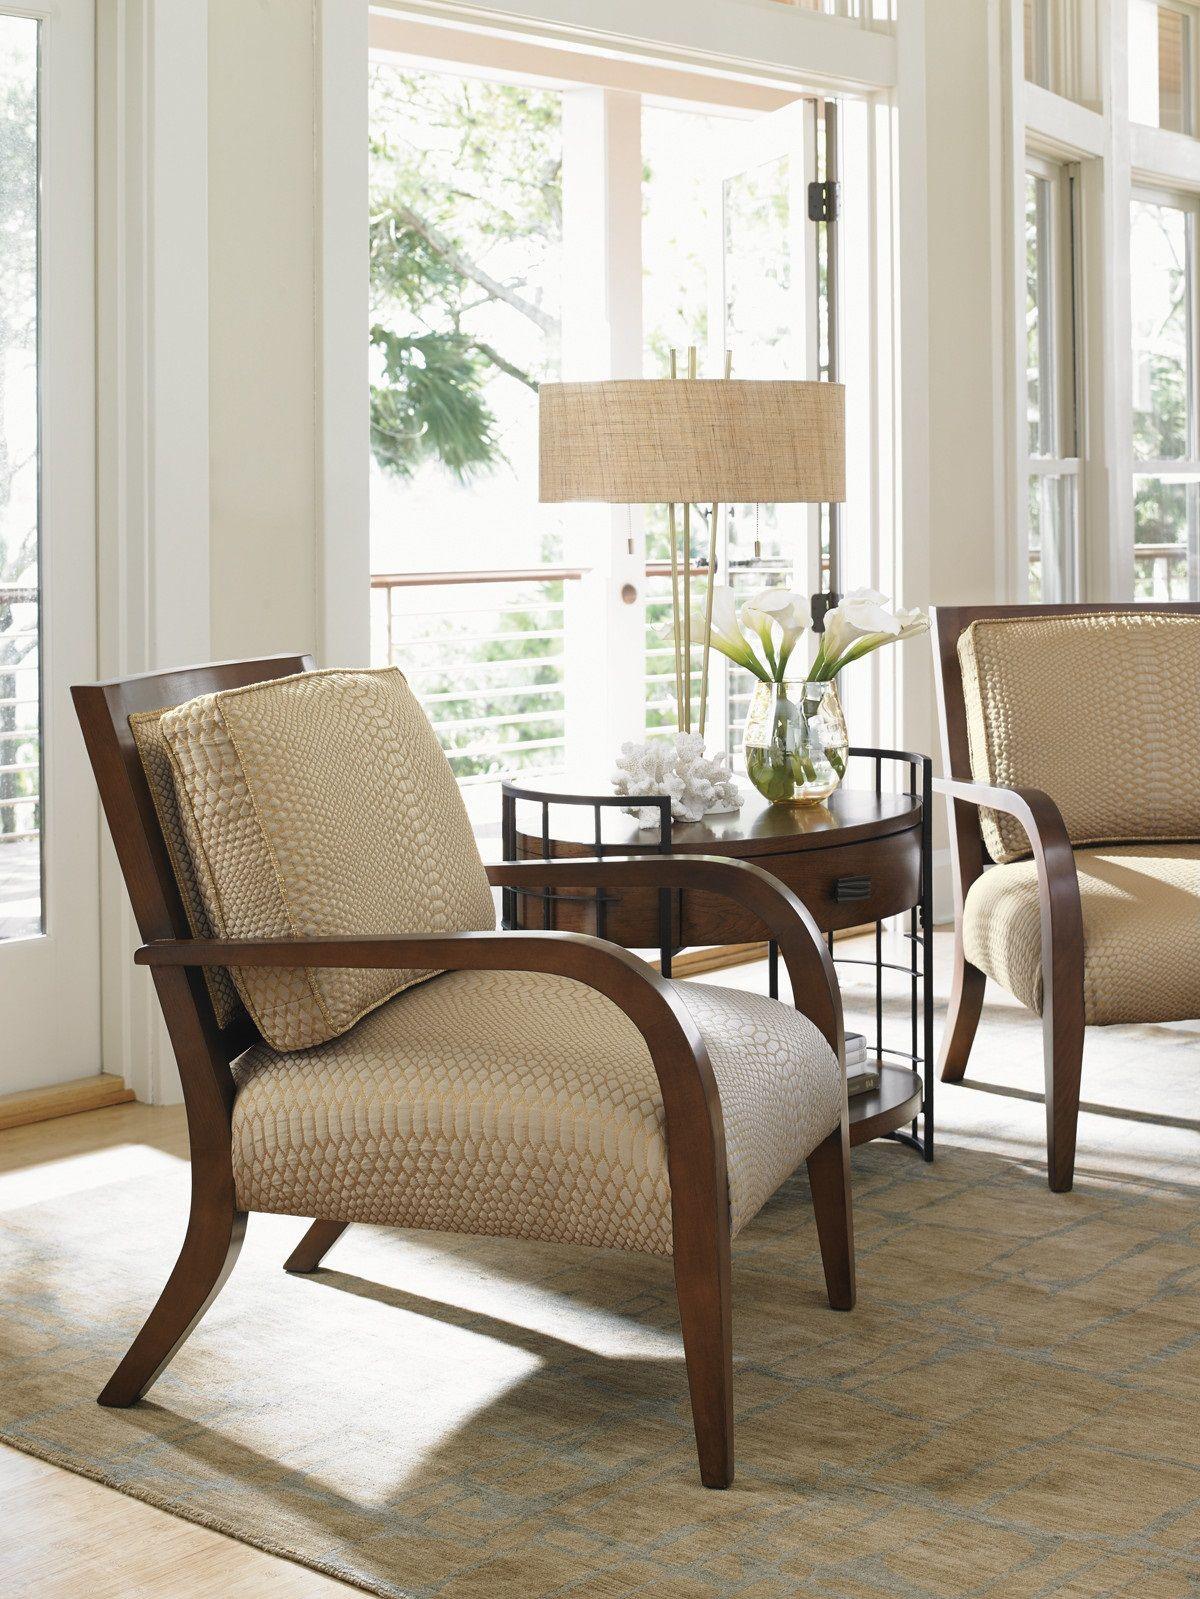 """Furniture"" Furniture Ideas, Living Room, Living Room"